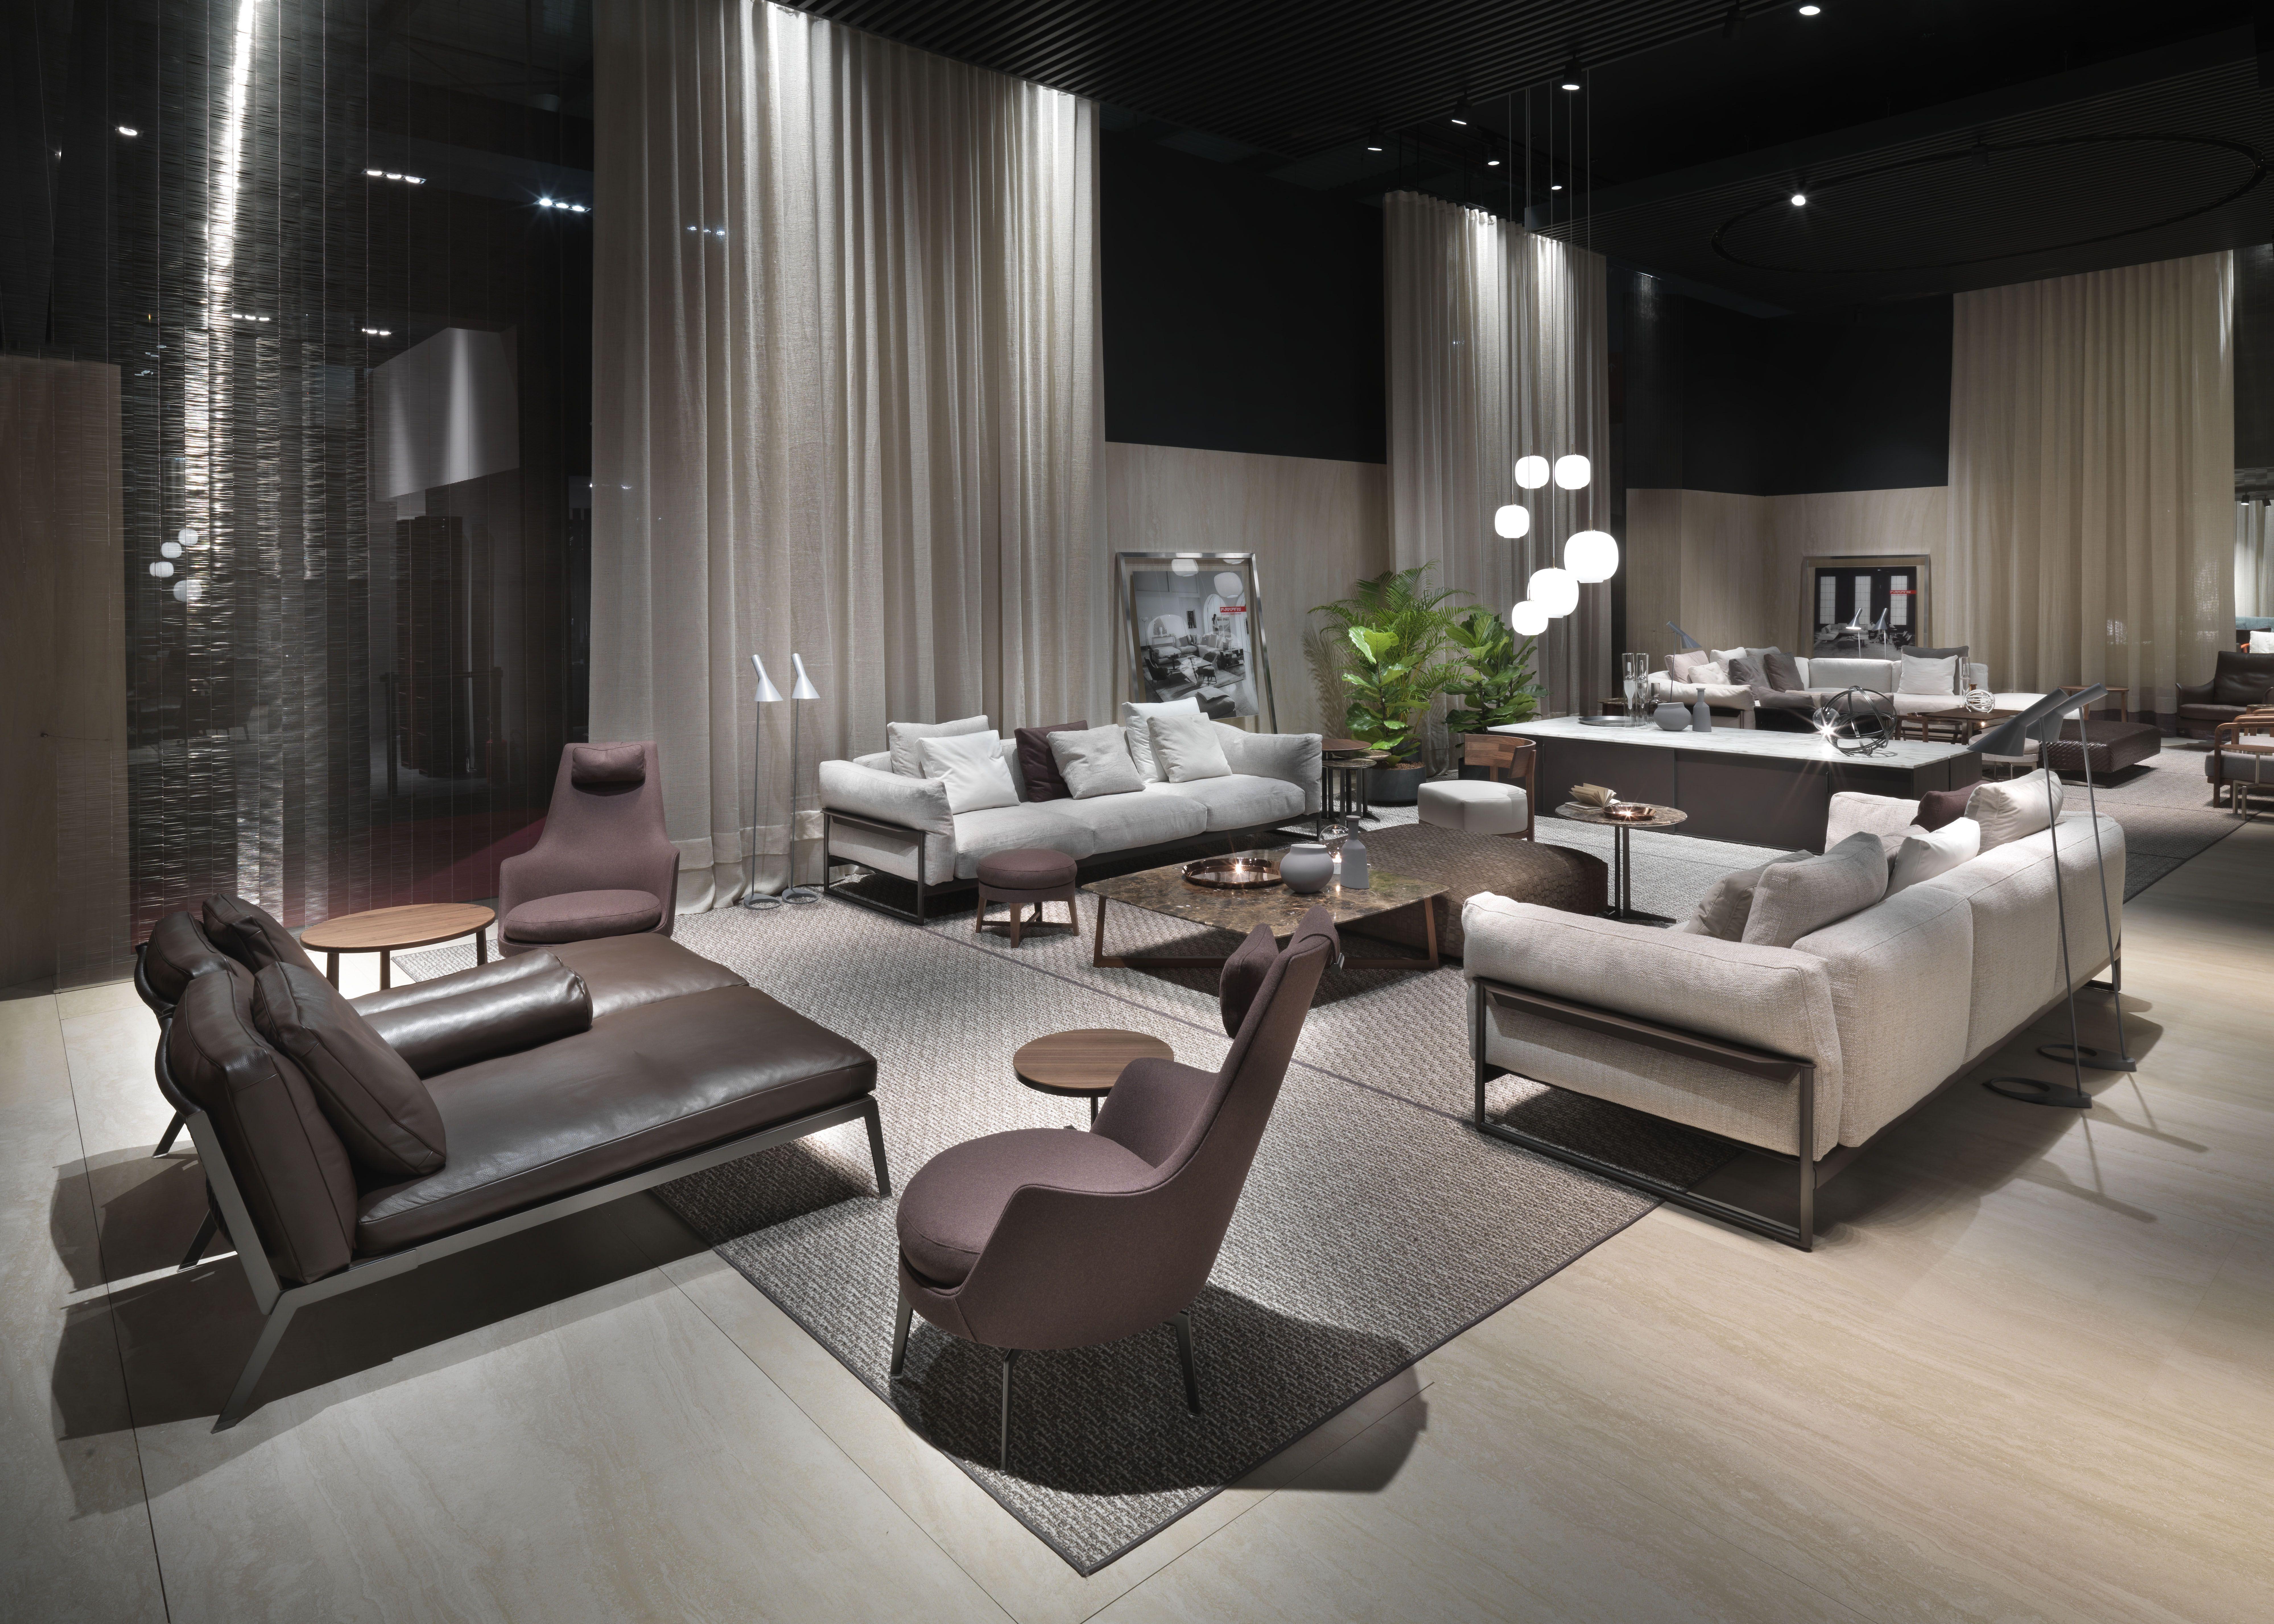 Fanfani mobili ~ Flexform zeno light #sofa and happy #chaiselongue #design antonio